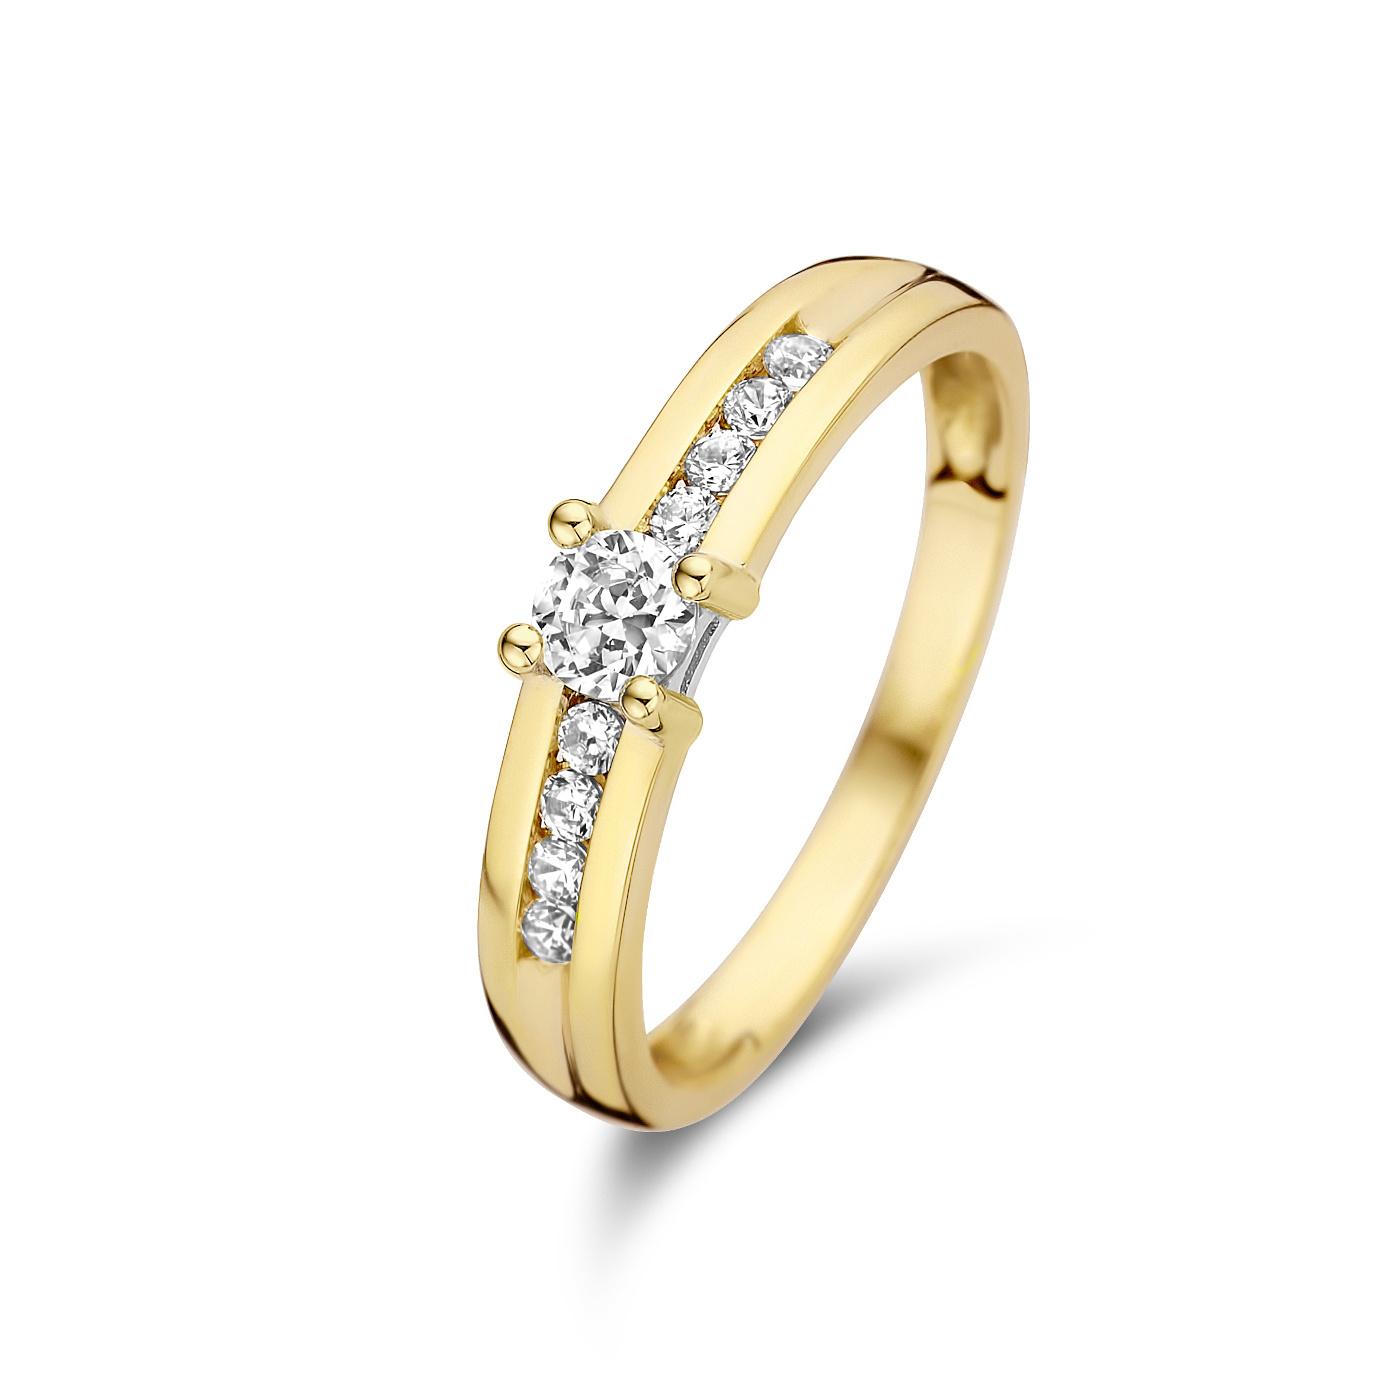 Isabel Bernard Le Marais Estee anello in oro 14 carati